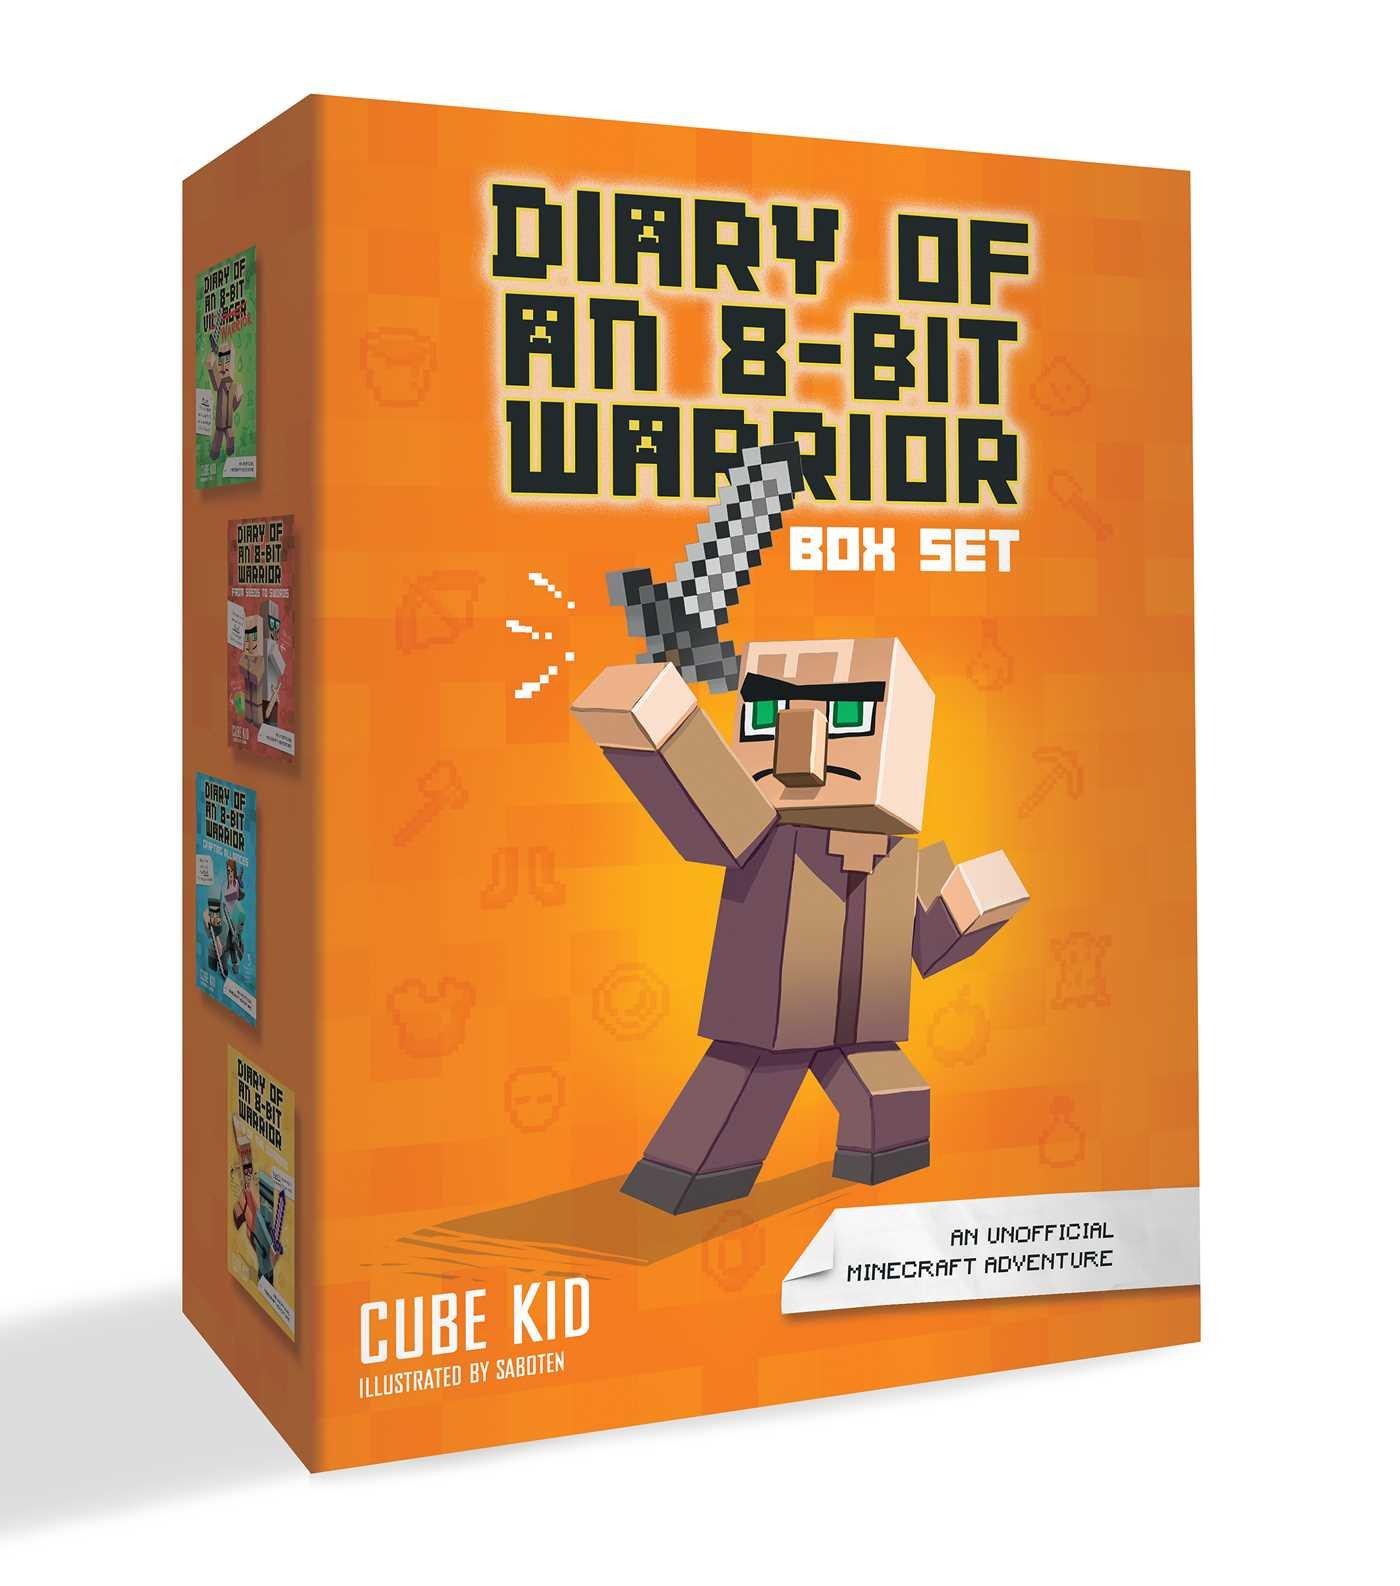 Diary 8 Bit Warrior Box Set product image